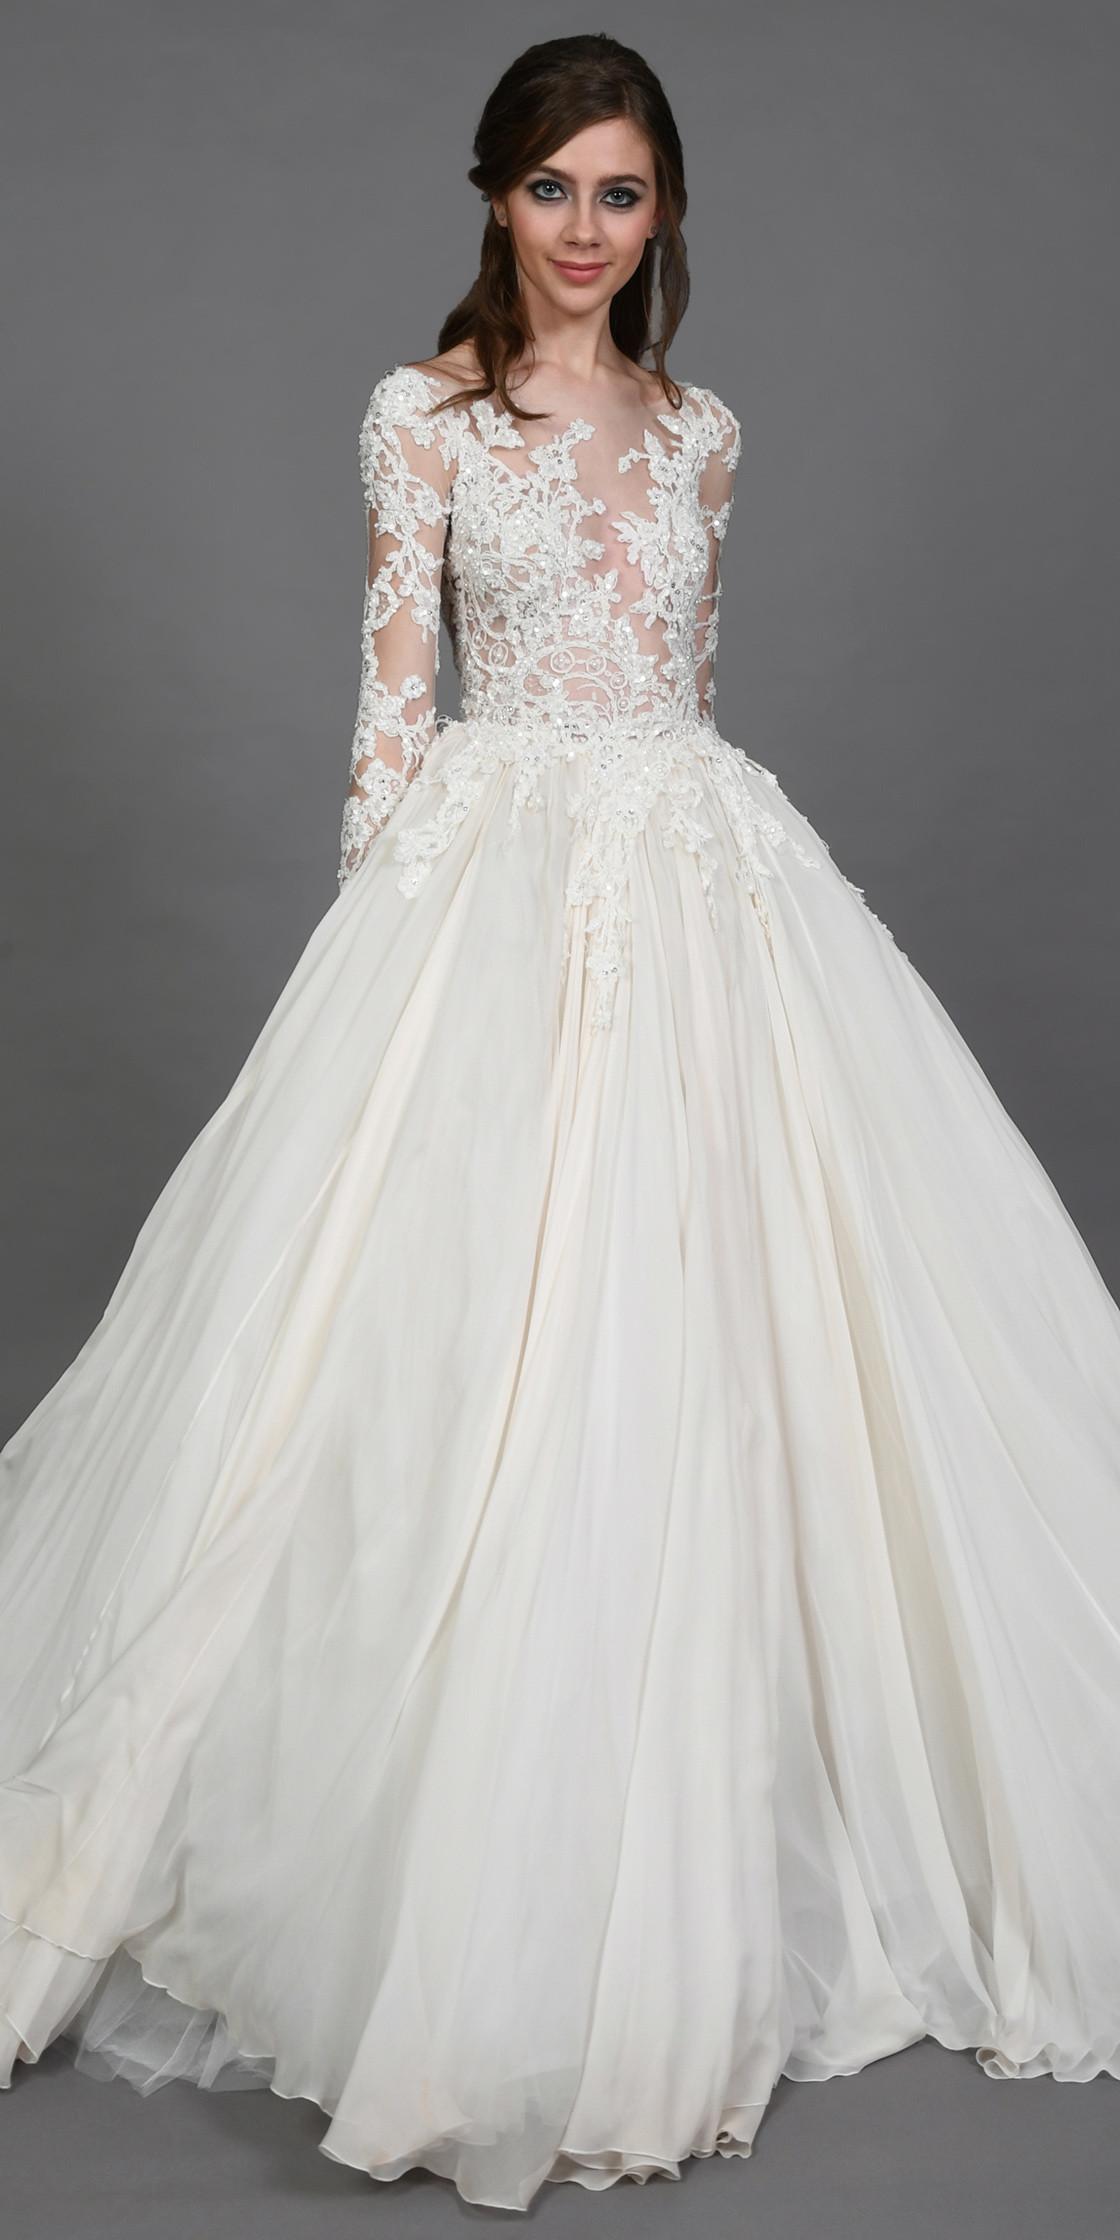 Zuhair Murad Lace Chiffon Gown Wedding Dress Rental Lebanon